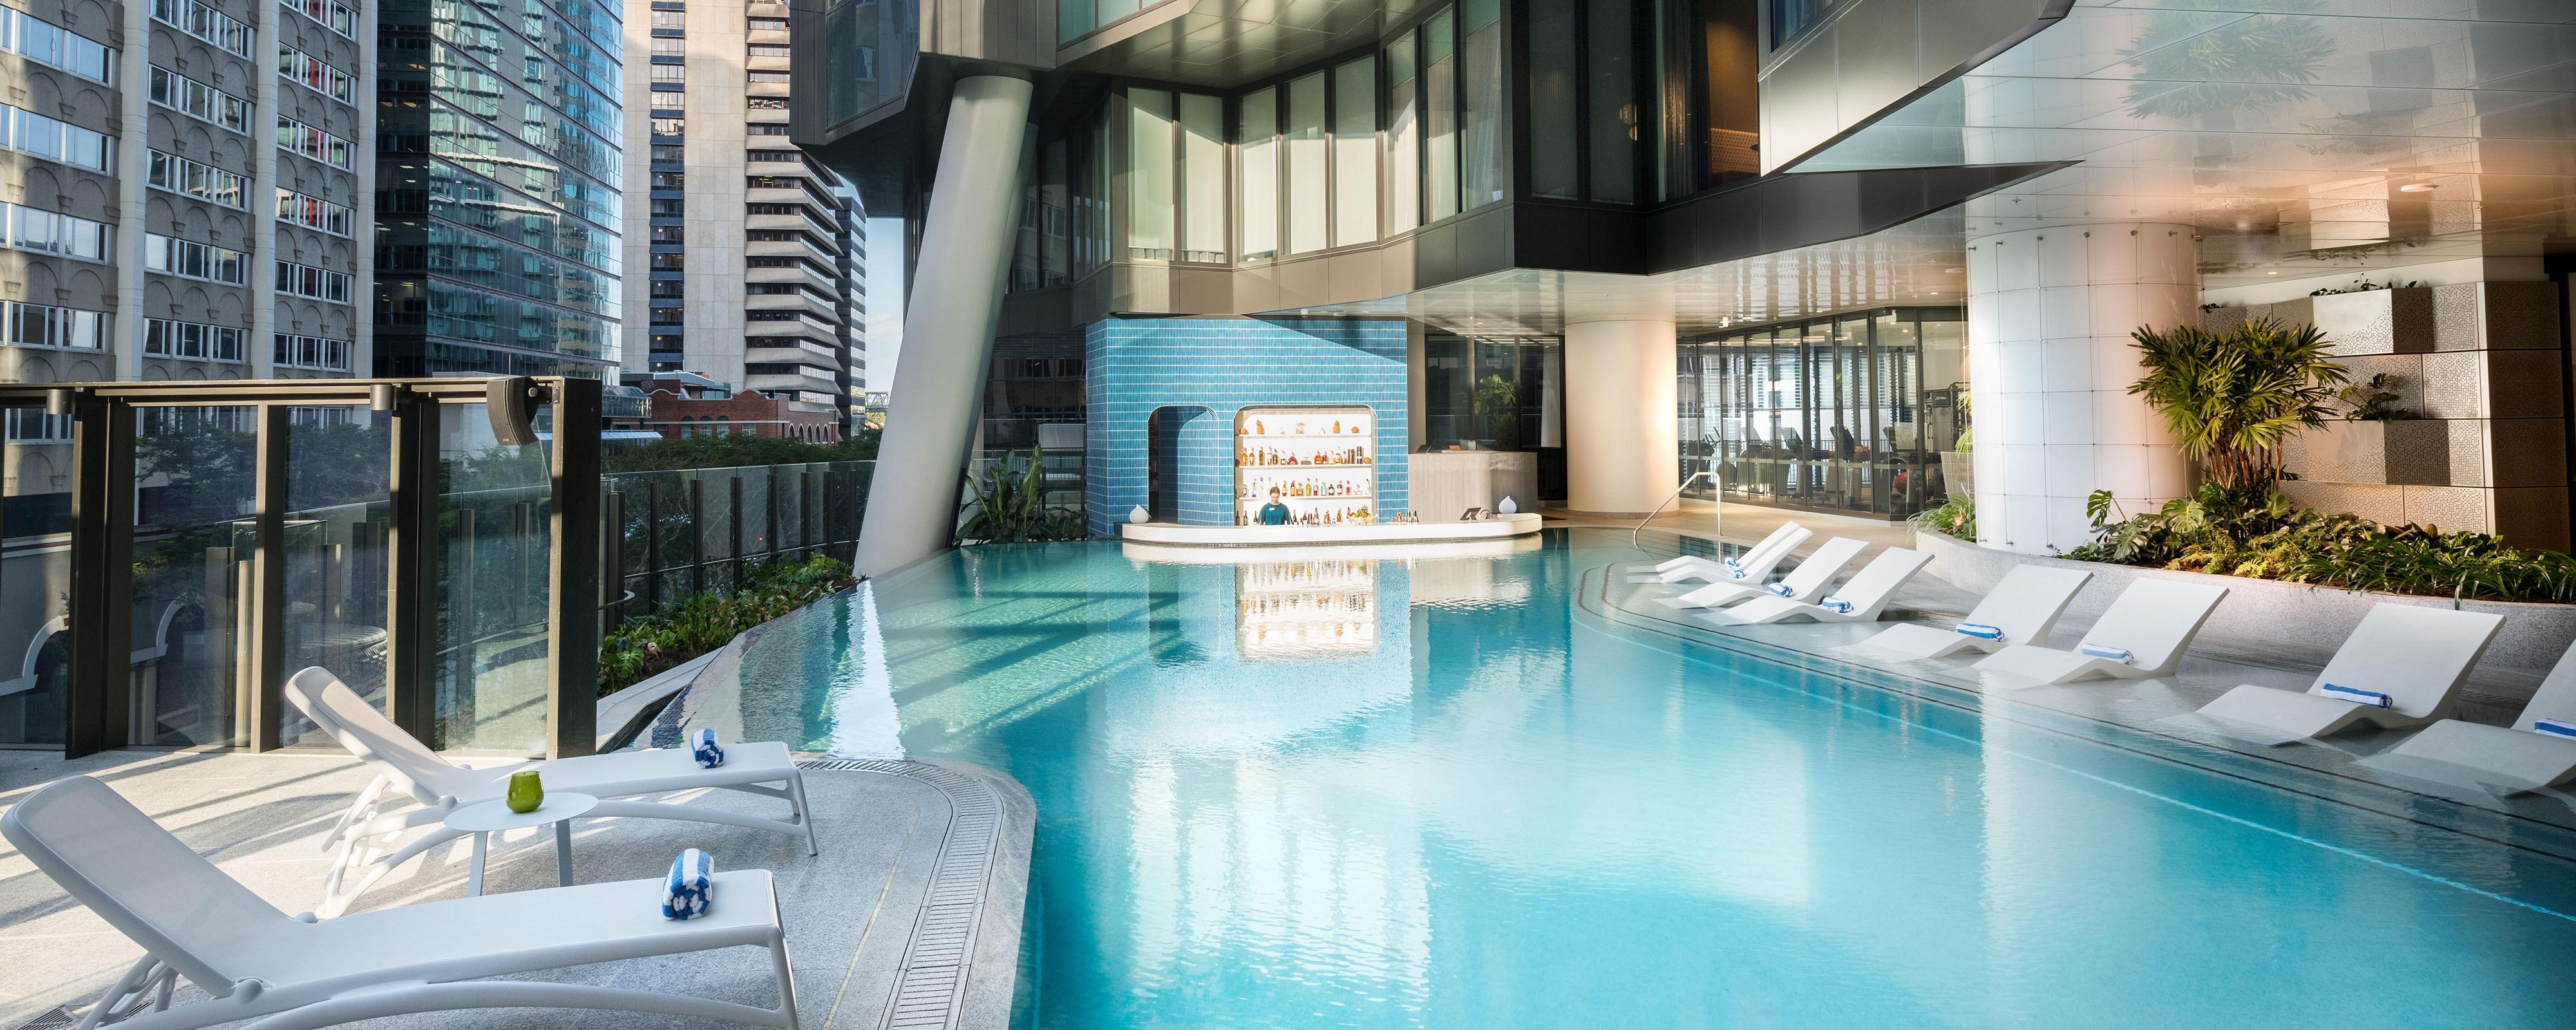 5 Star Brisbane City Centre Hotel The Westin Brisbane